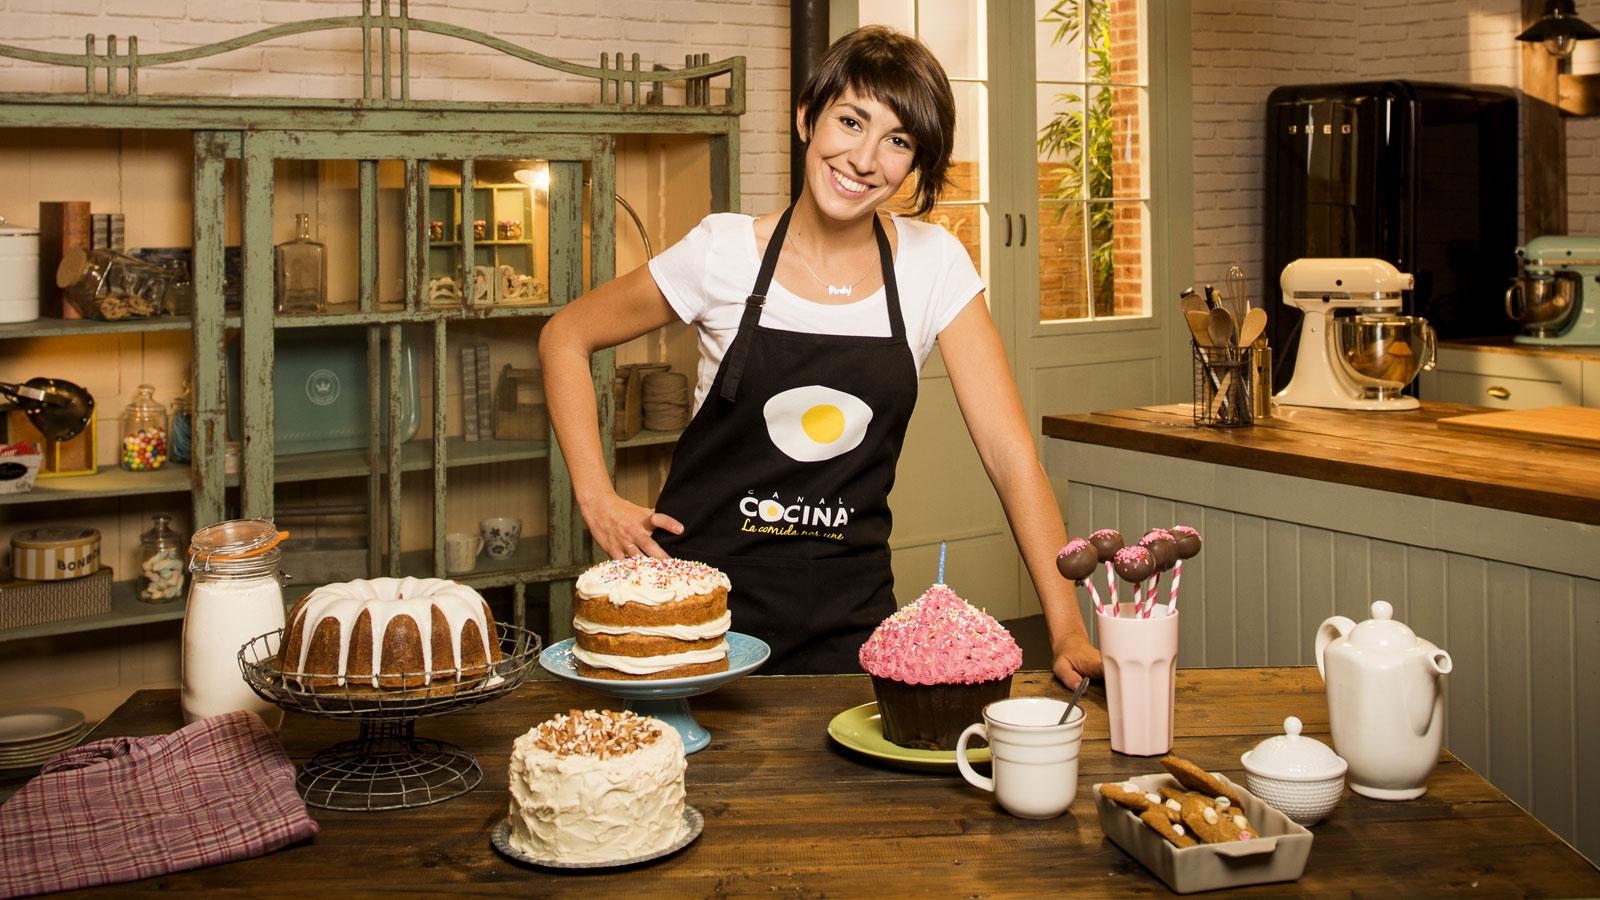 Alma obreg n la reina del cupcake especiales canal cocina for Canal cocina cocina de familia